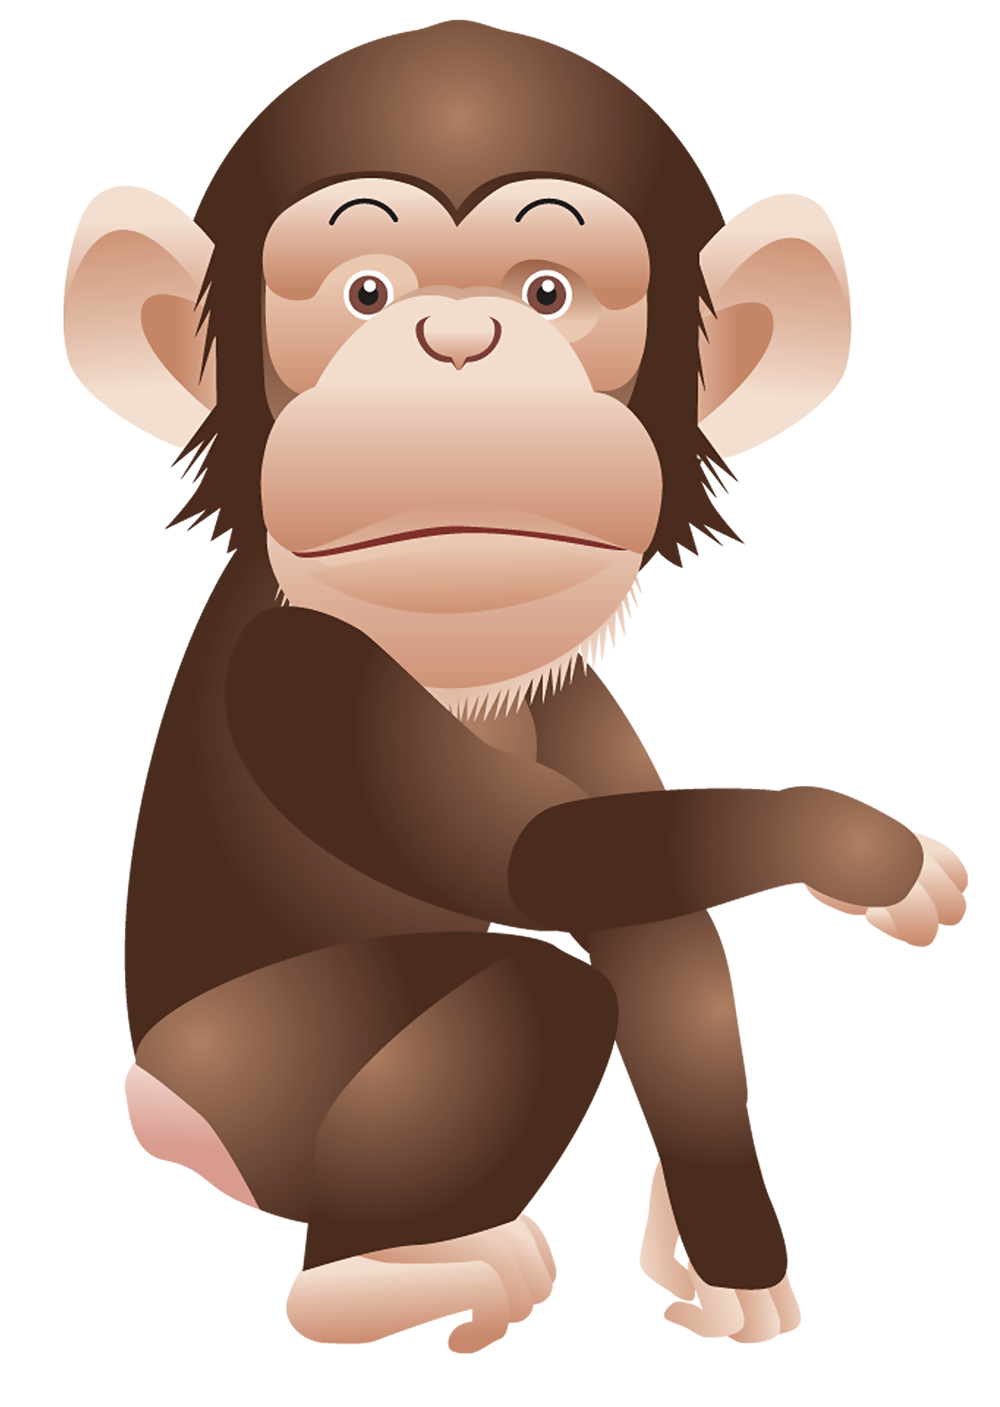 svg Monkey png animal pinterest. Ape clipart chimpanzee